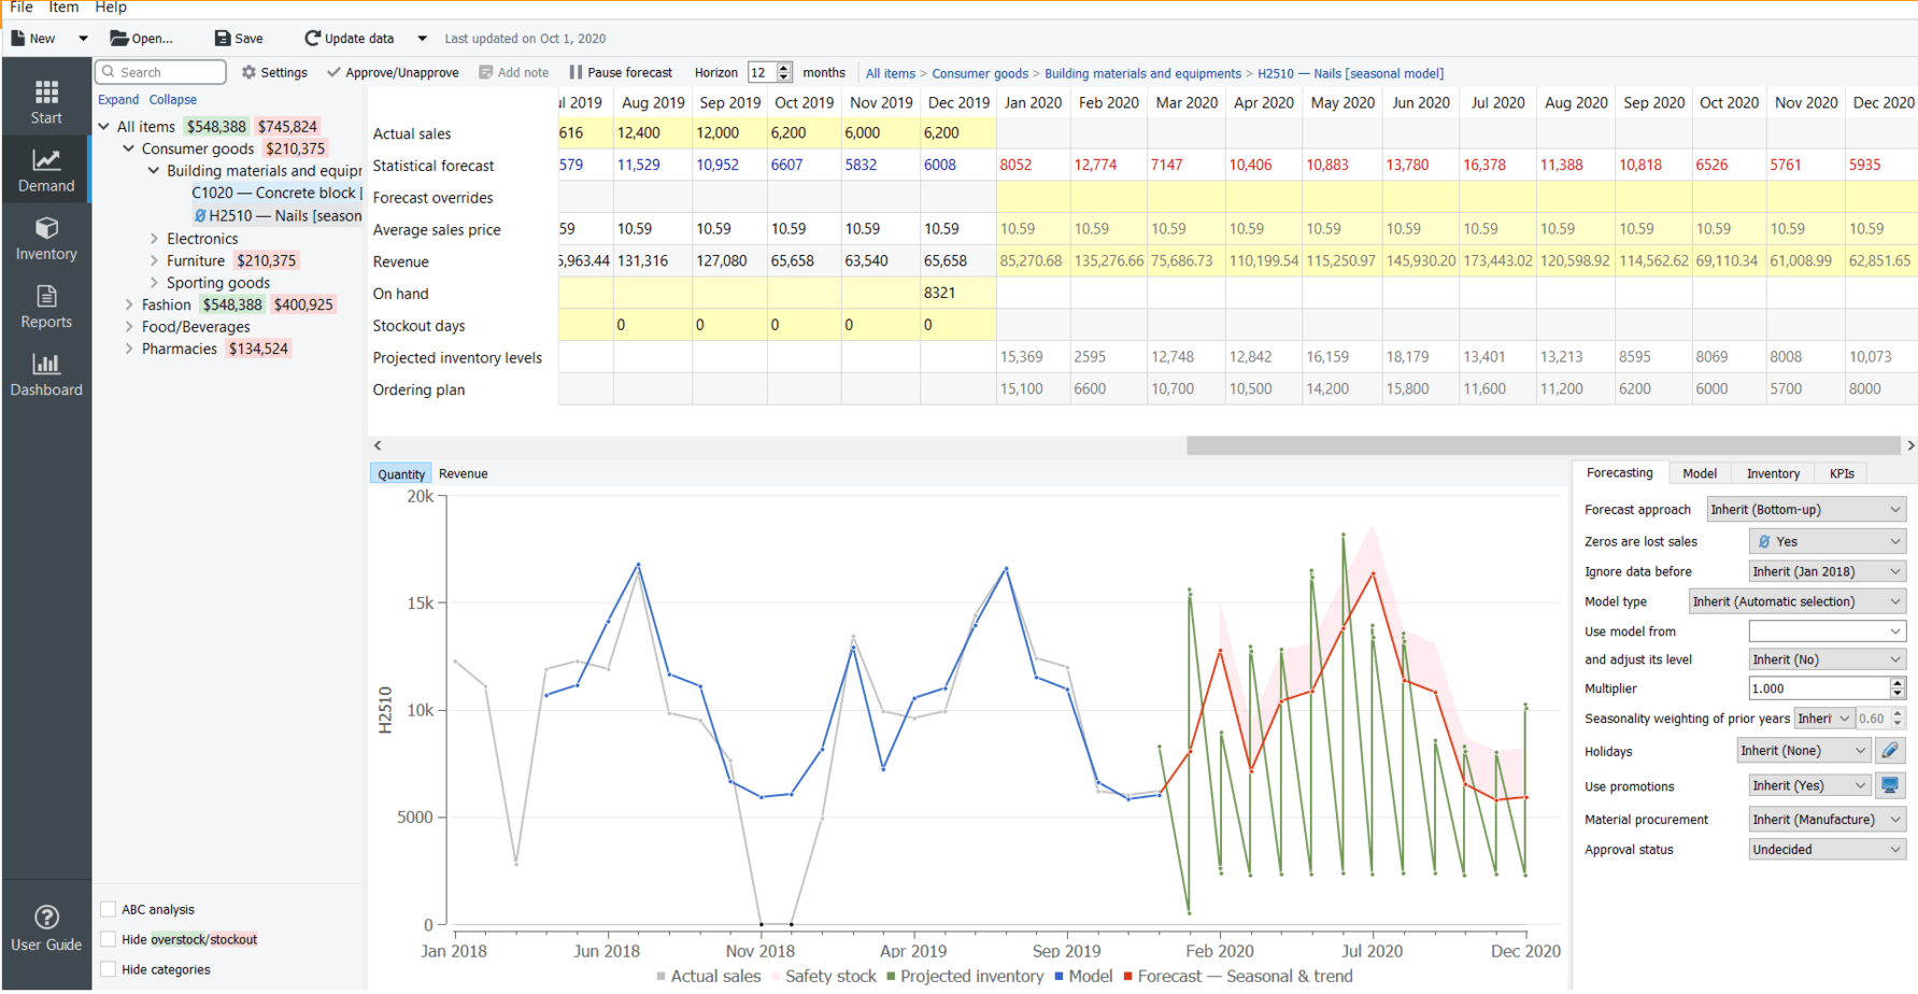 NetSuite Demand Forecasting Software